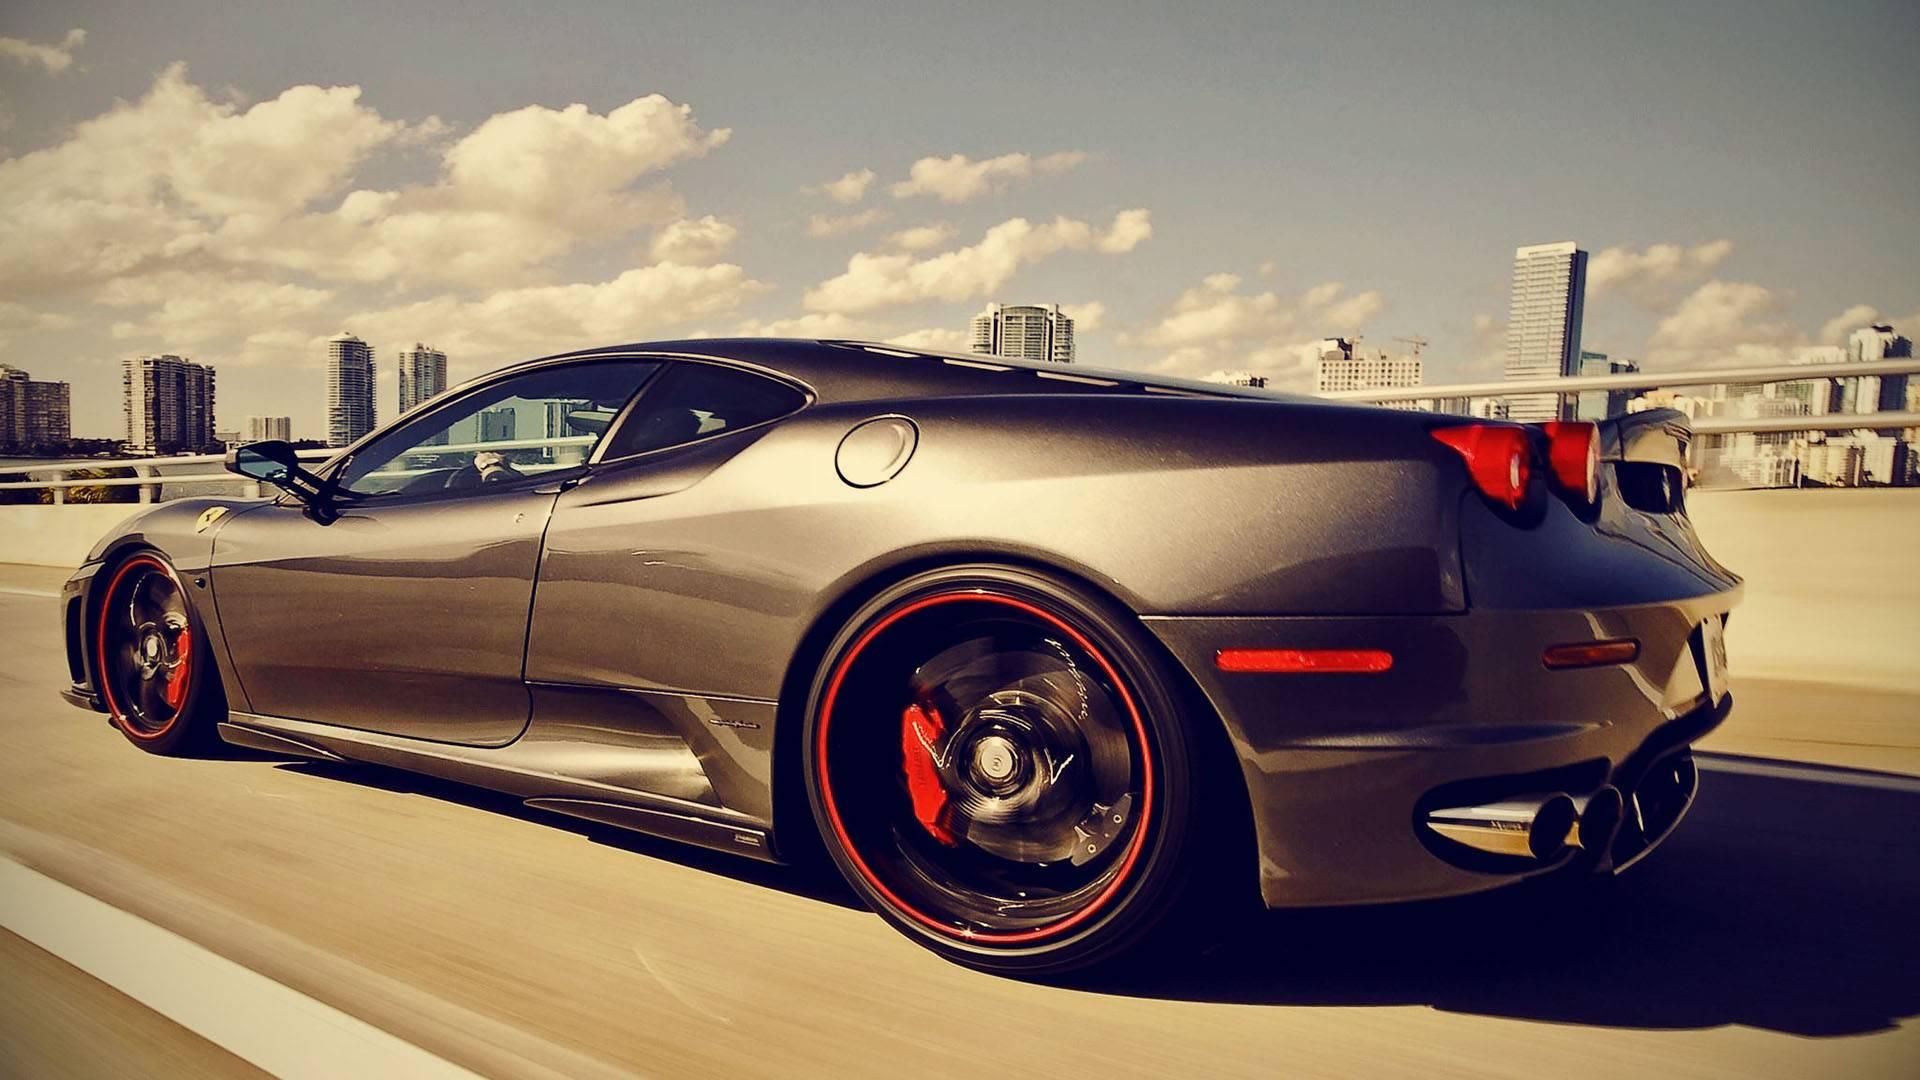 Ferrari Luxury Model Cars 18 Cool Car Hd Wallpaper